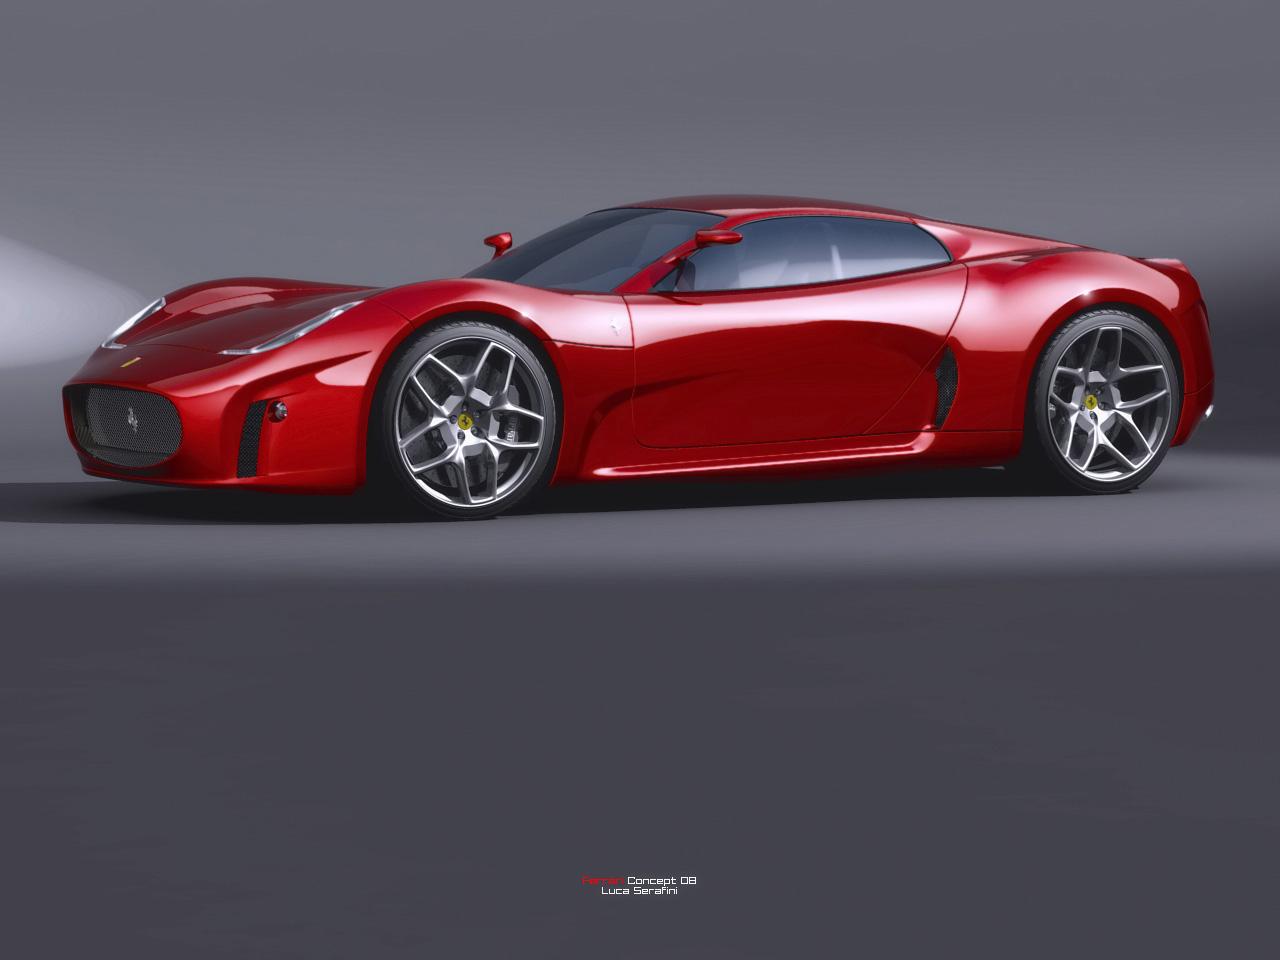 Ferrari Concept 2008 Design by Luca Serafini Side Angle World Cars Wallpaper For Free